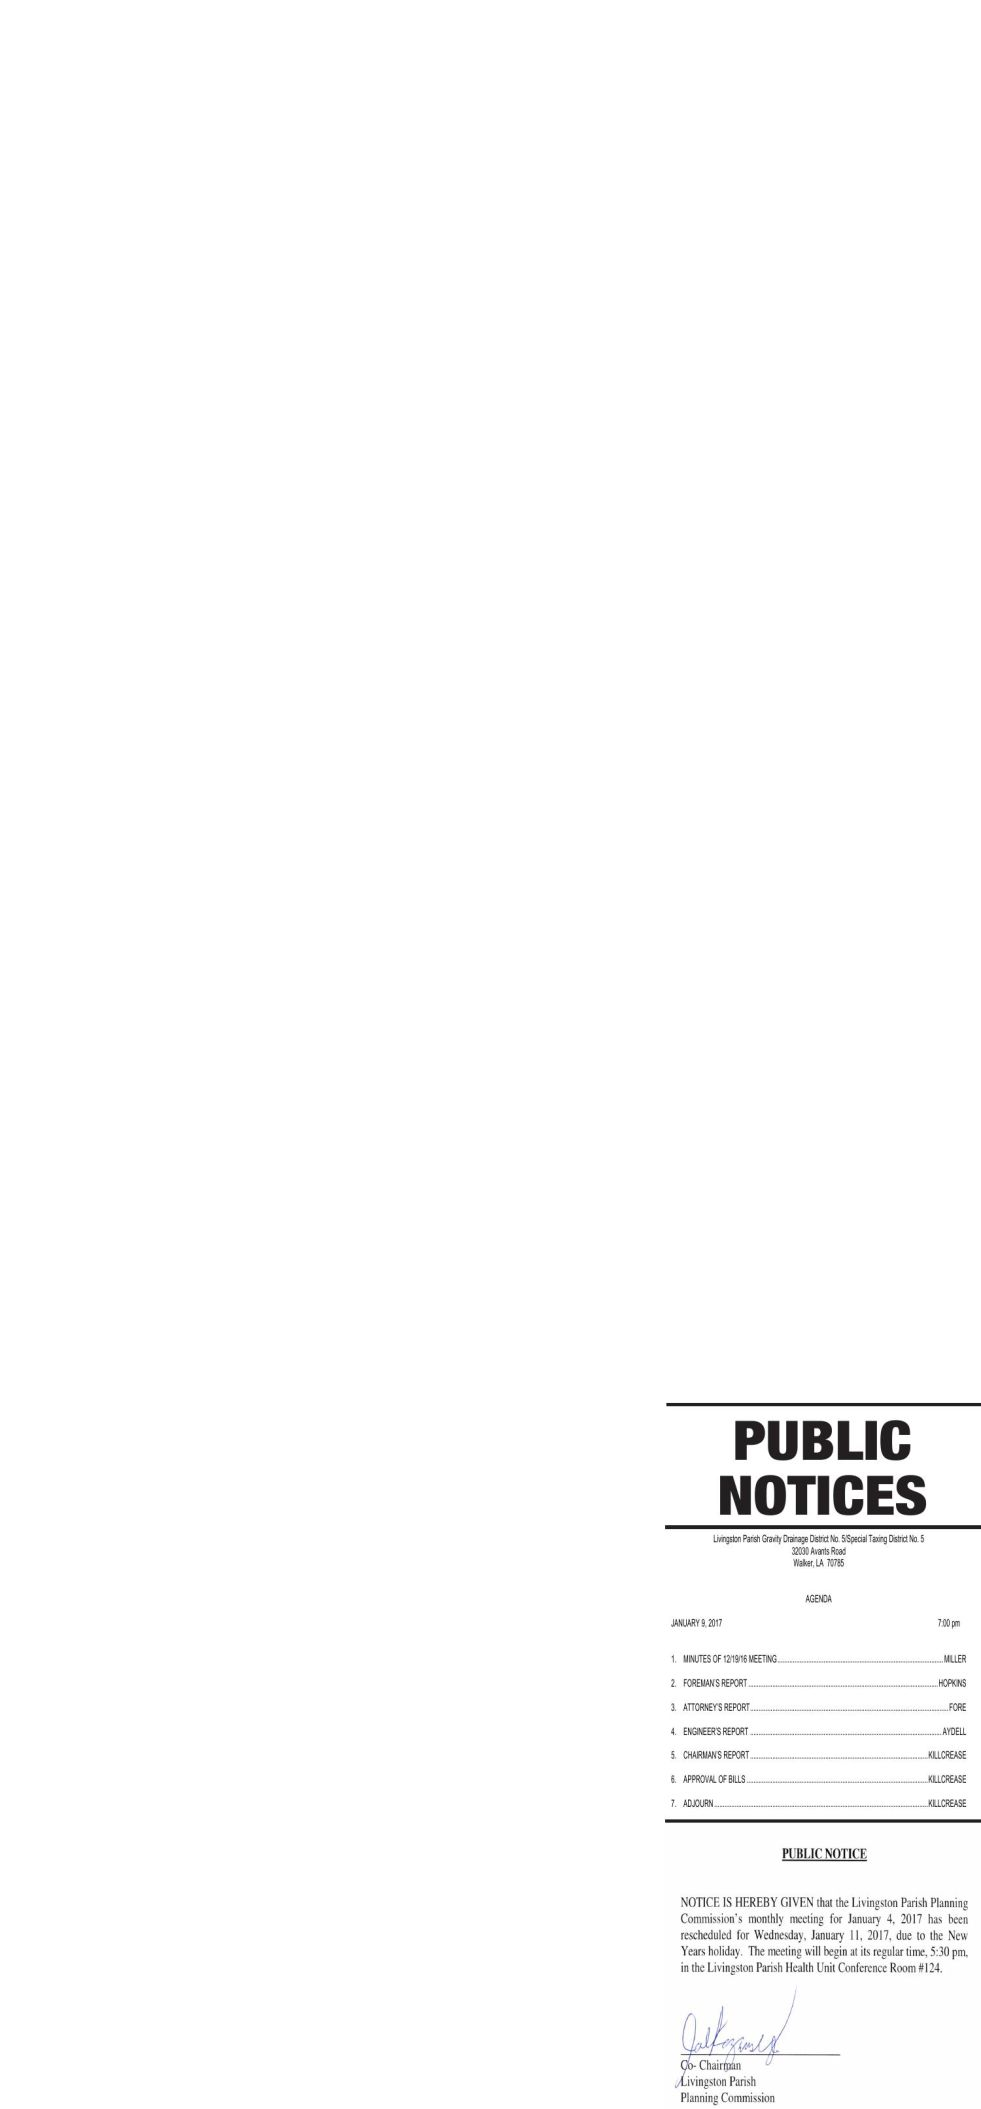 Public Notices published January 5, 2017